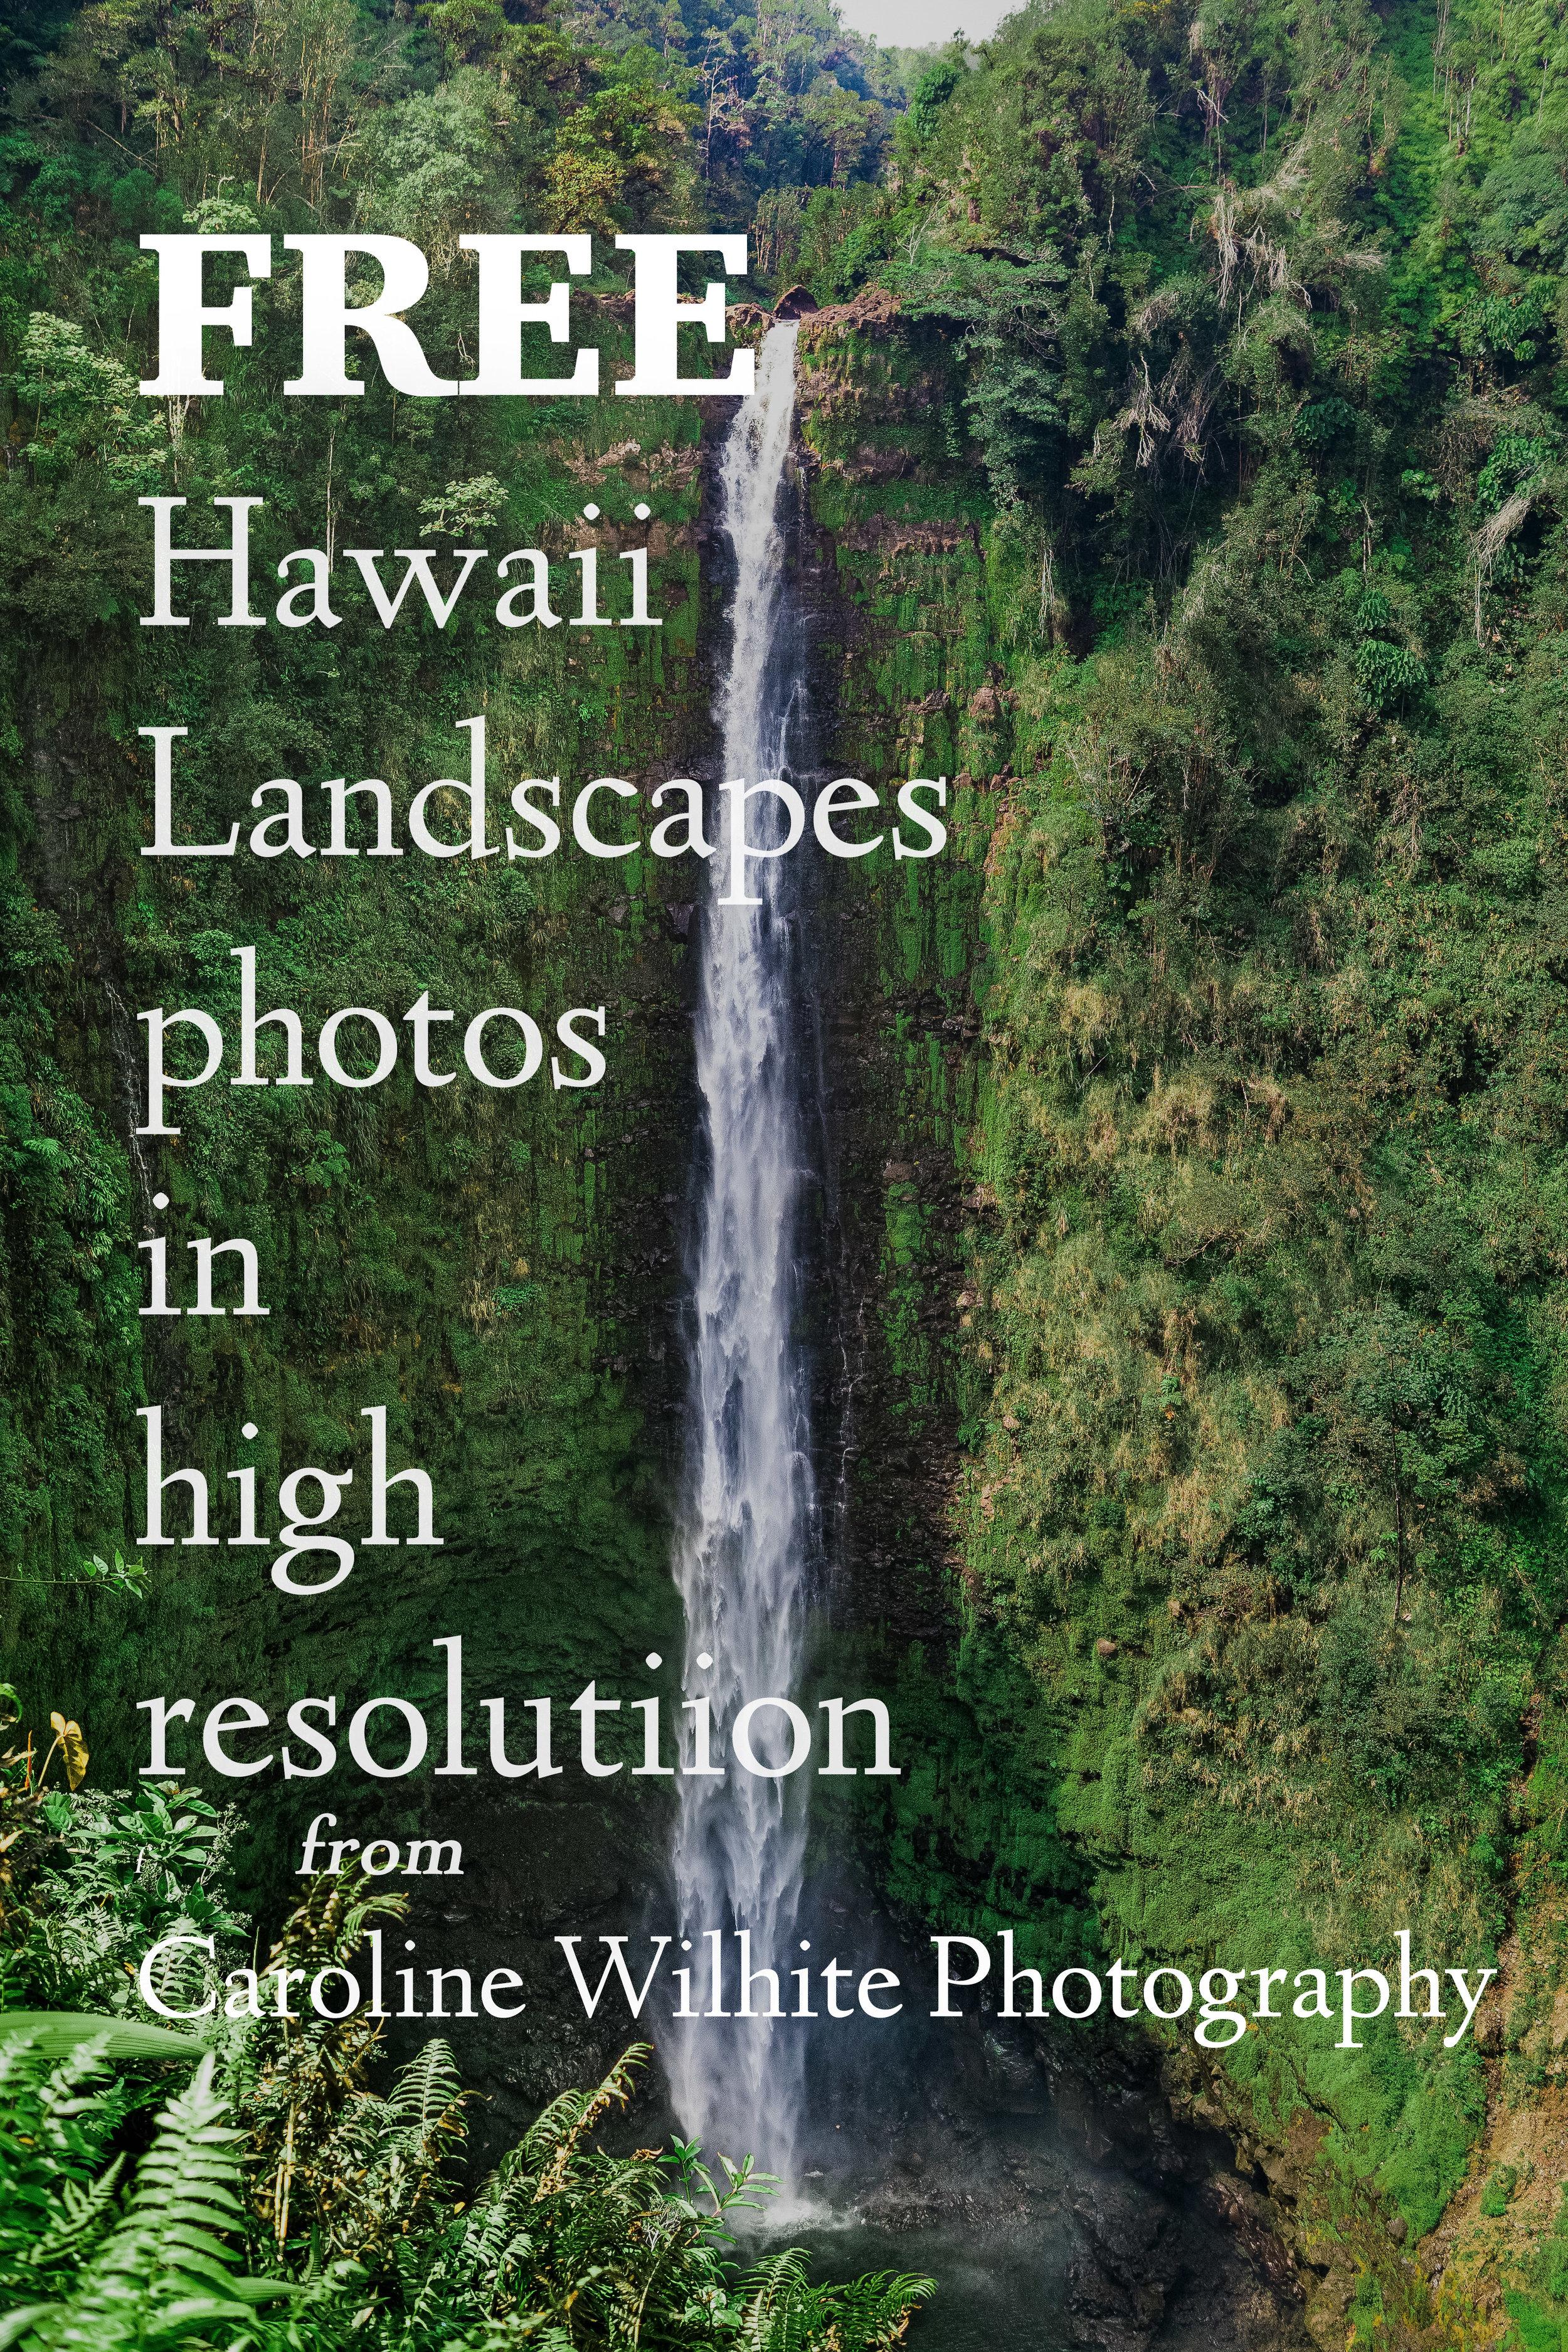 Free Hawaii Photos from Caroline Wilhite Photography